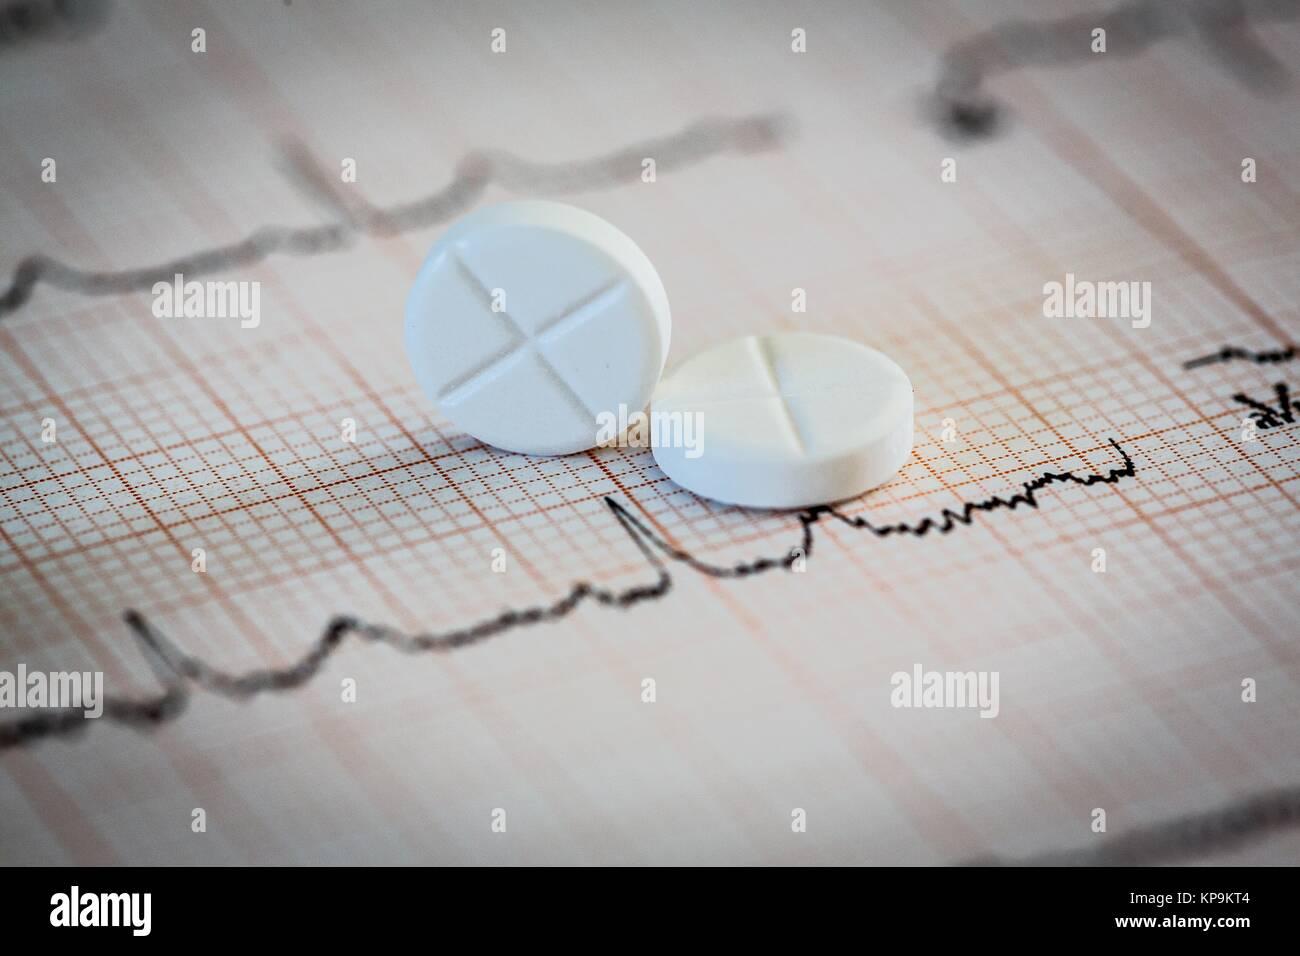 Altace Heart Medication